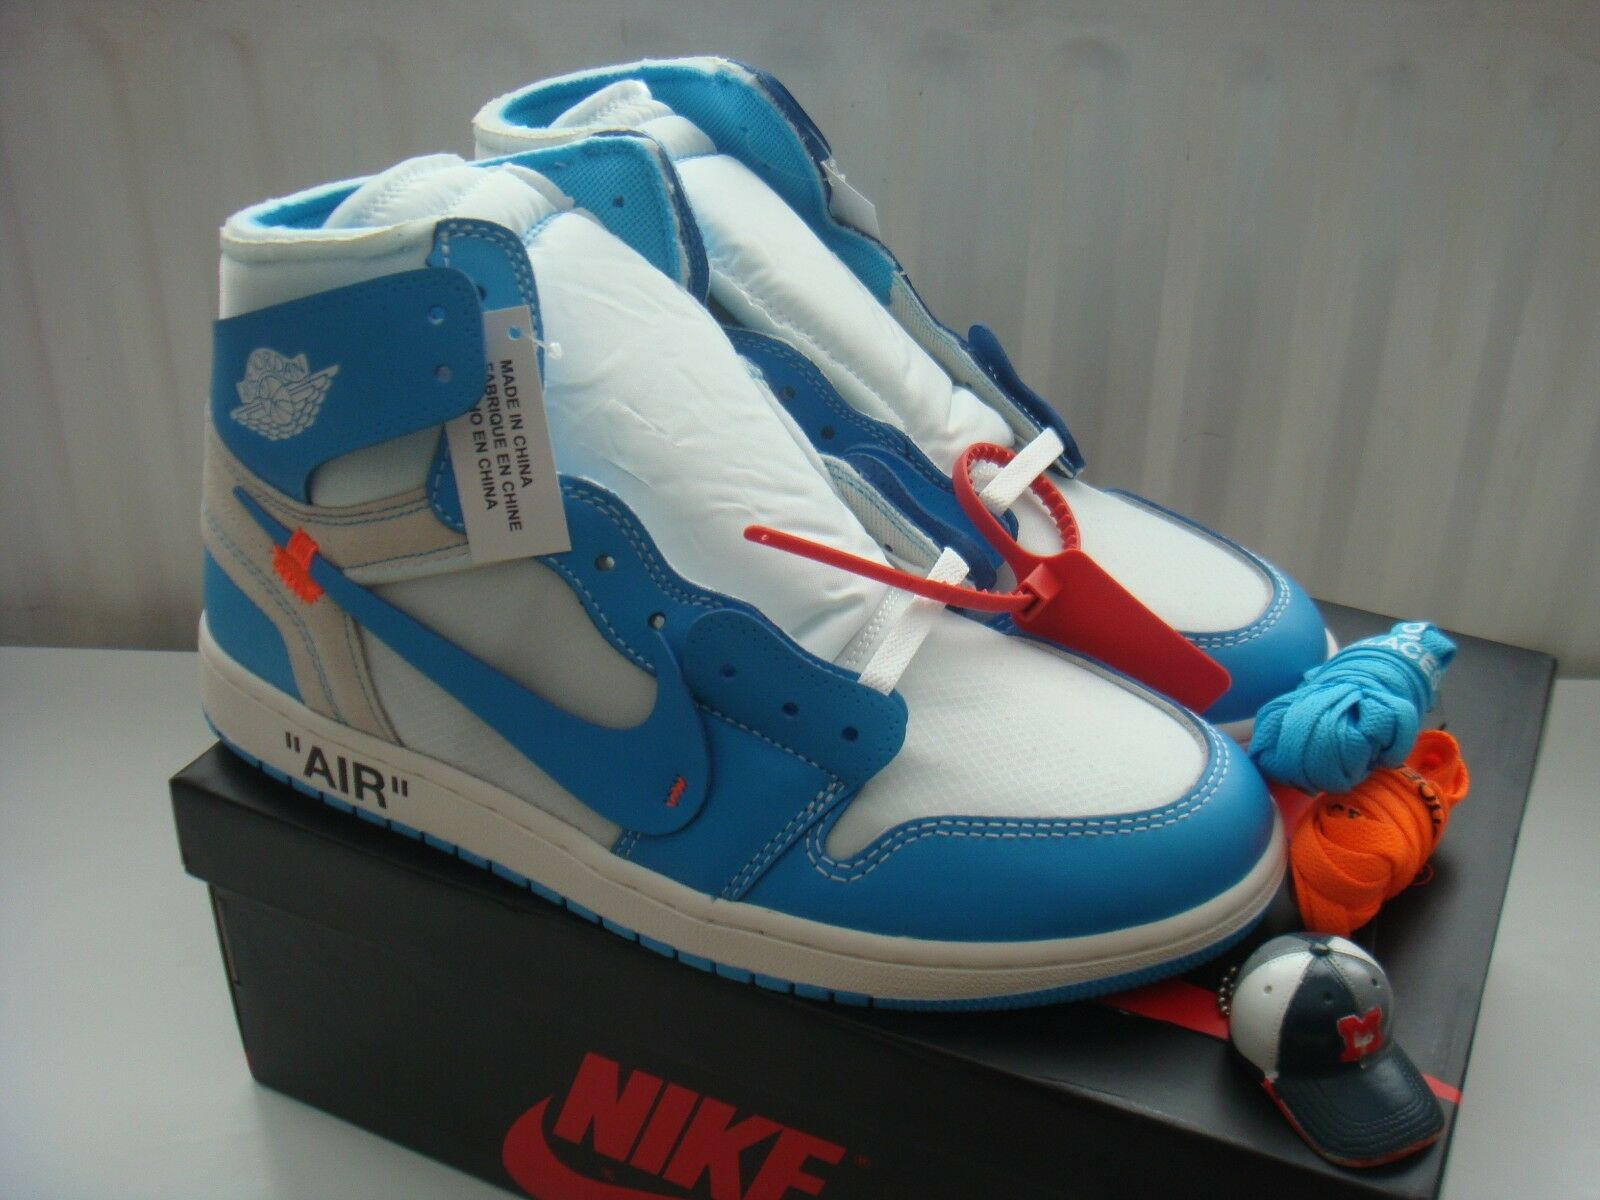 Nike x blanc-cassé Air Jordan I 1 unc Etats-Unis 11/UK 10 Bleu Poudre/CAROLINE/abloh